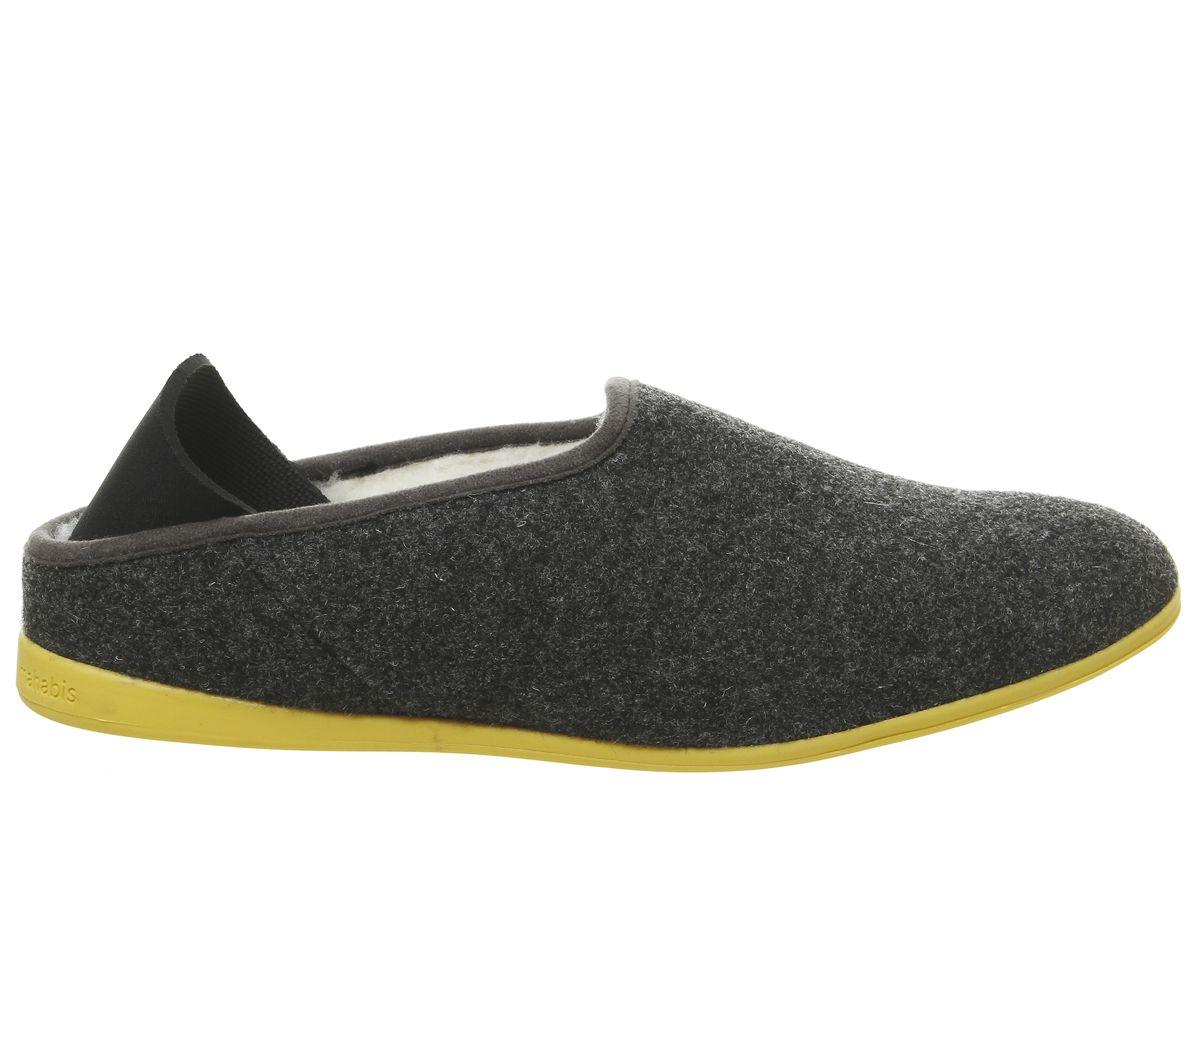 8d44e7008ee Mahabis Mahabis Classic Slippers Larvik Dark Grey Yellow Sole - Slippers